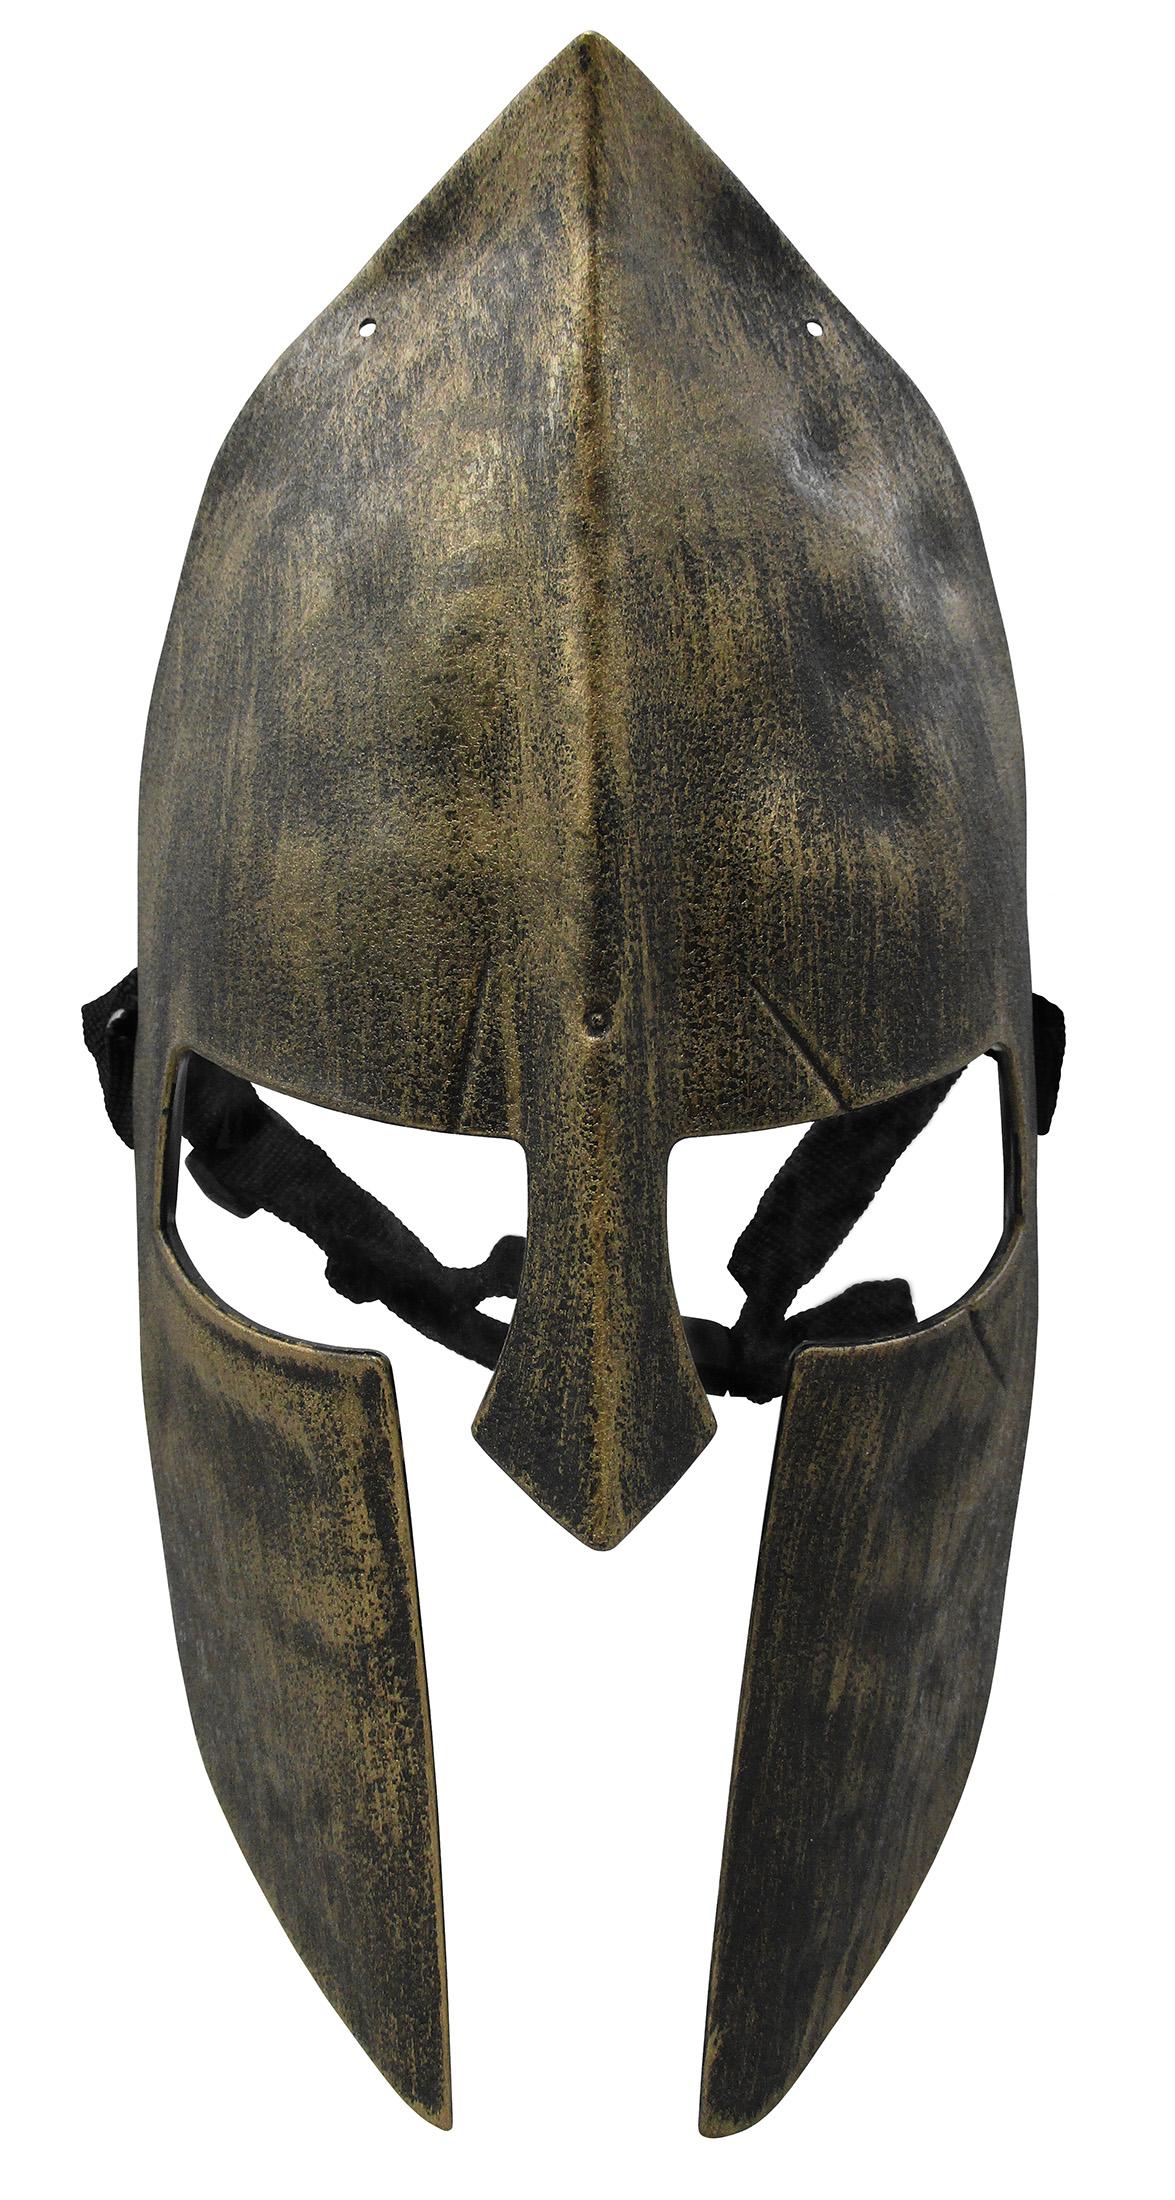 thumbnail 3 - Medieval Iron Knight Spartan Helmet Face Mask Roman Warrior Greek Costume